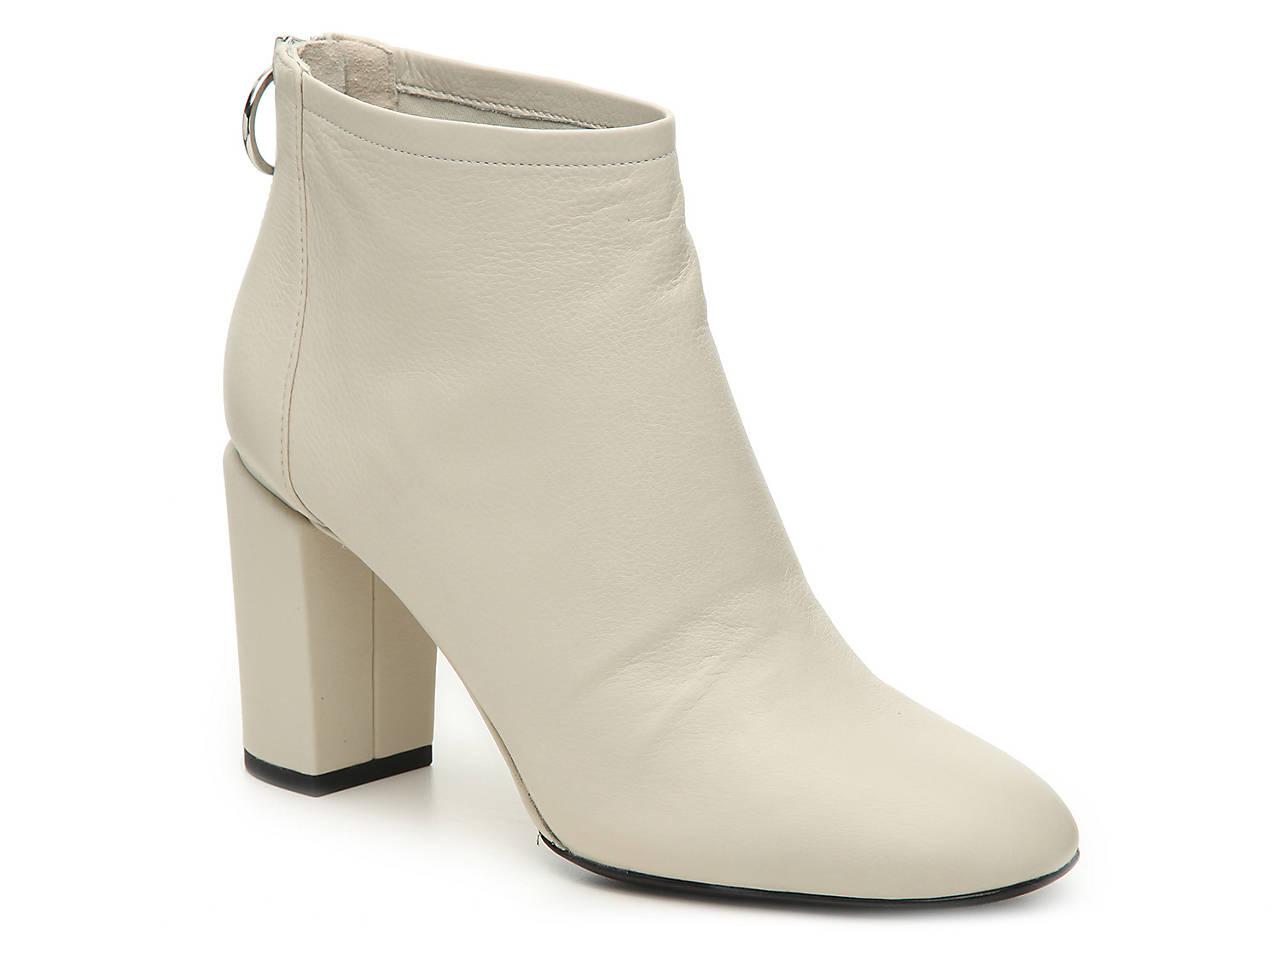 6d2dd1b4917828 Via Spiga Nadia Bootie Women s Shoes